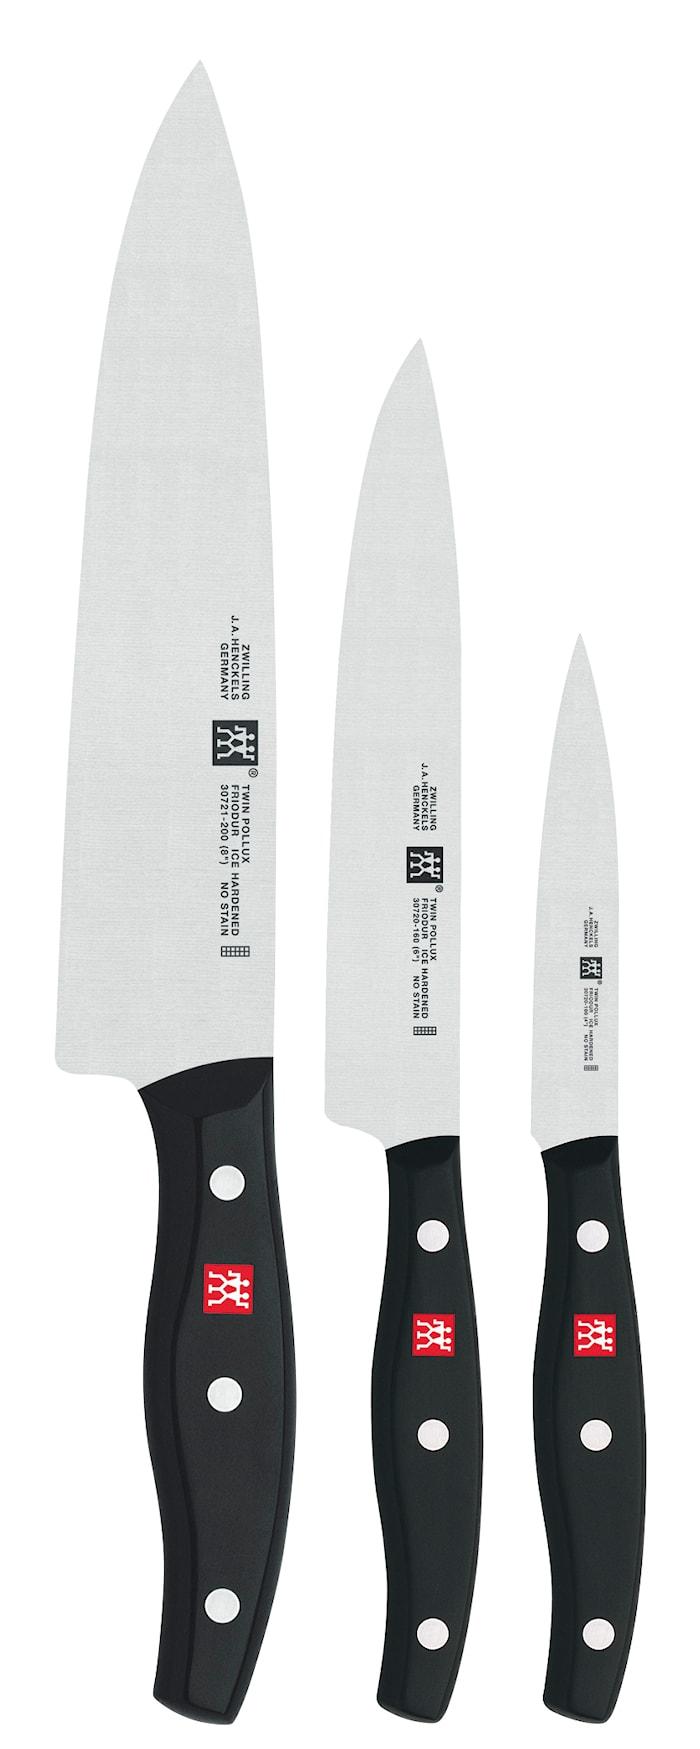 TWIN® Pollux Knivset 3 Knivar